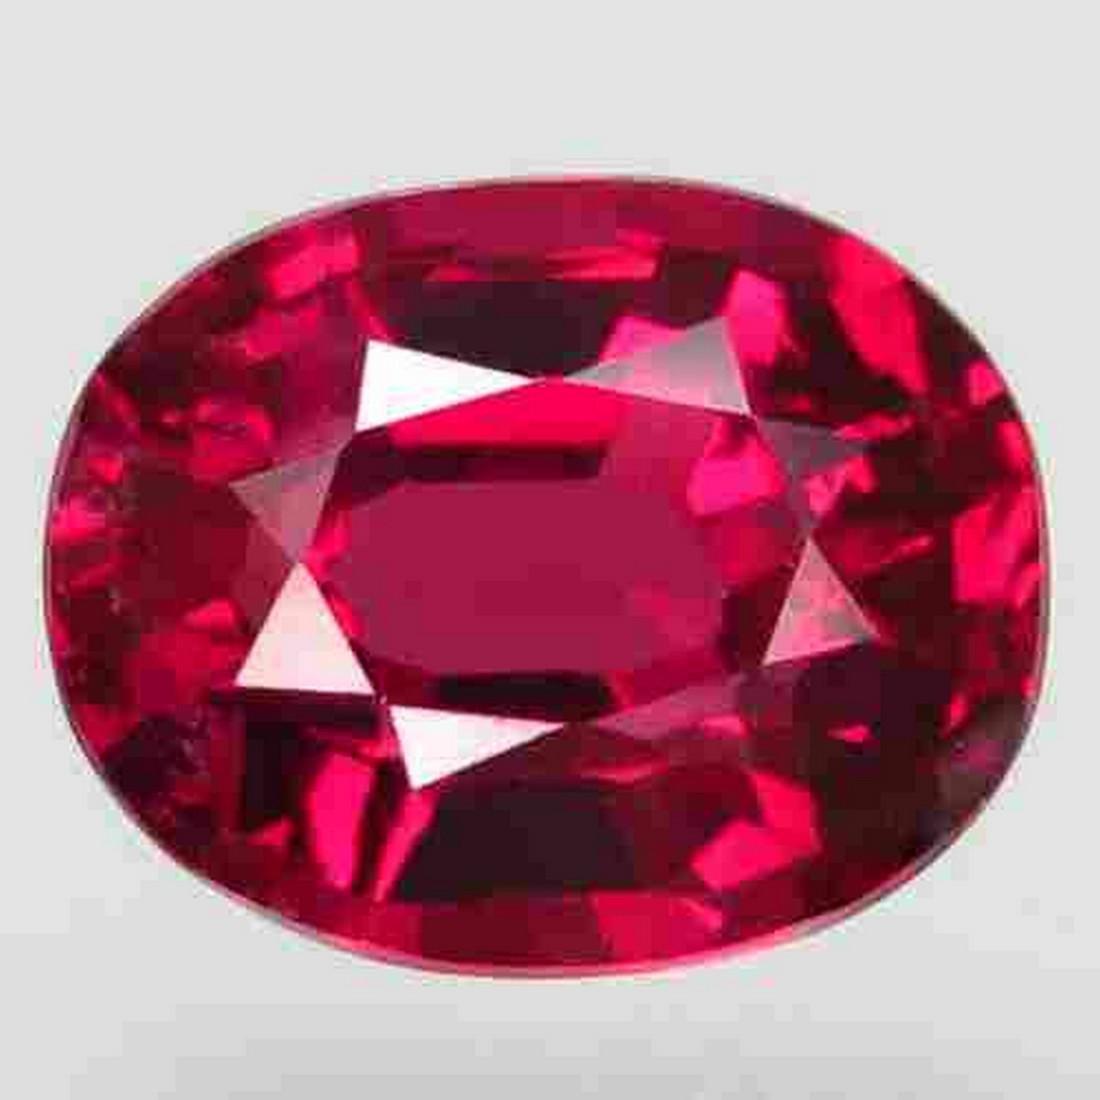 2.54 ct natural top red pink rhodolite garnet